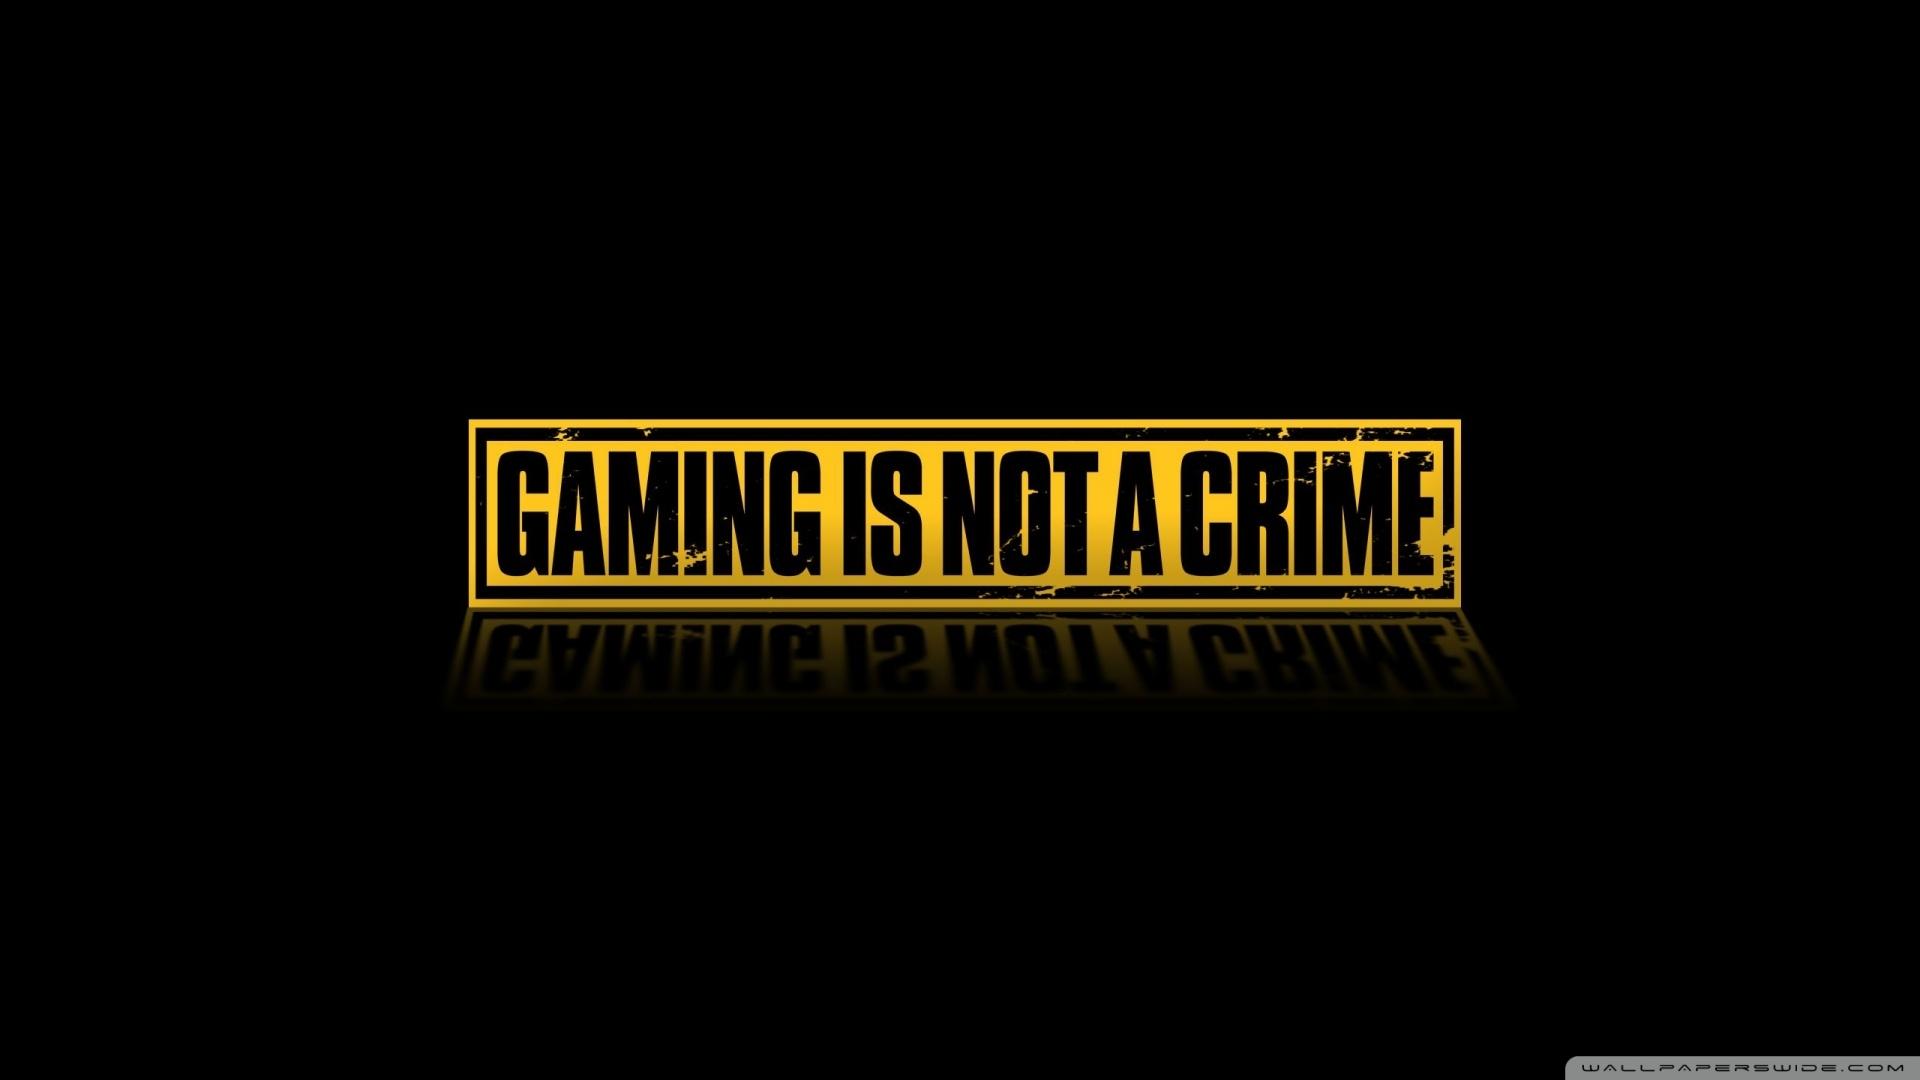 gaming is not a crime ❤ 4k hd desktop wallpaper for 4k ultra hd tv